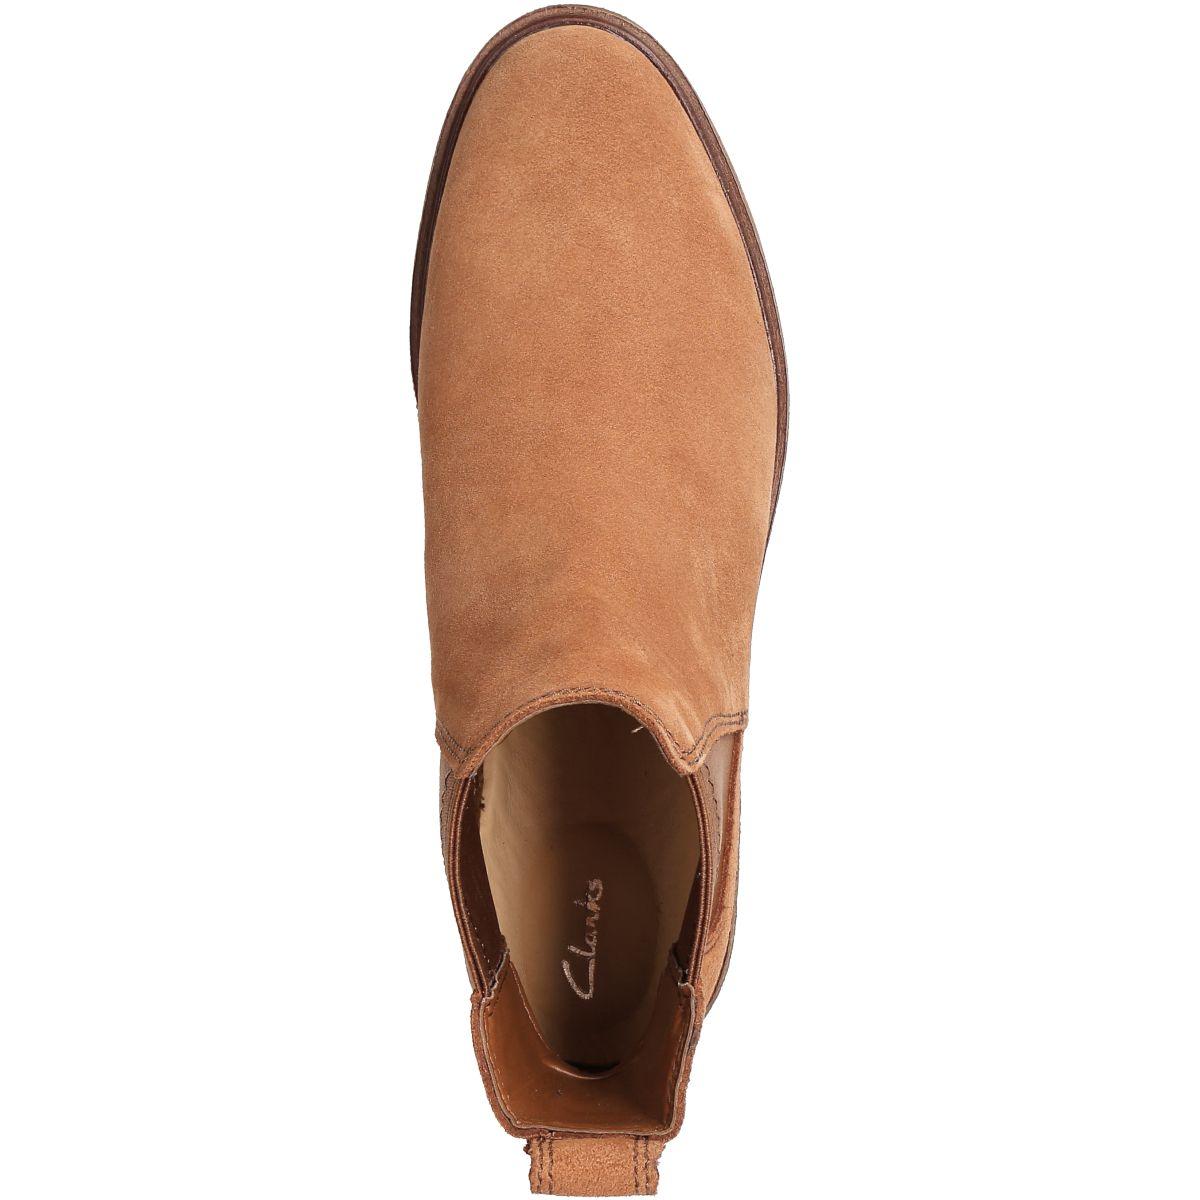 Clarks Clarkdale Arlo 26138060 4 Women's shoes Half boots